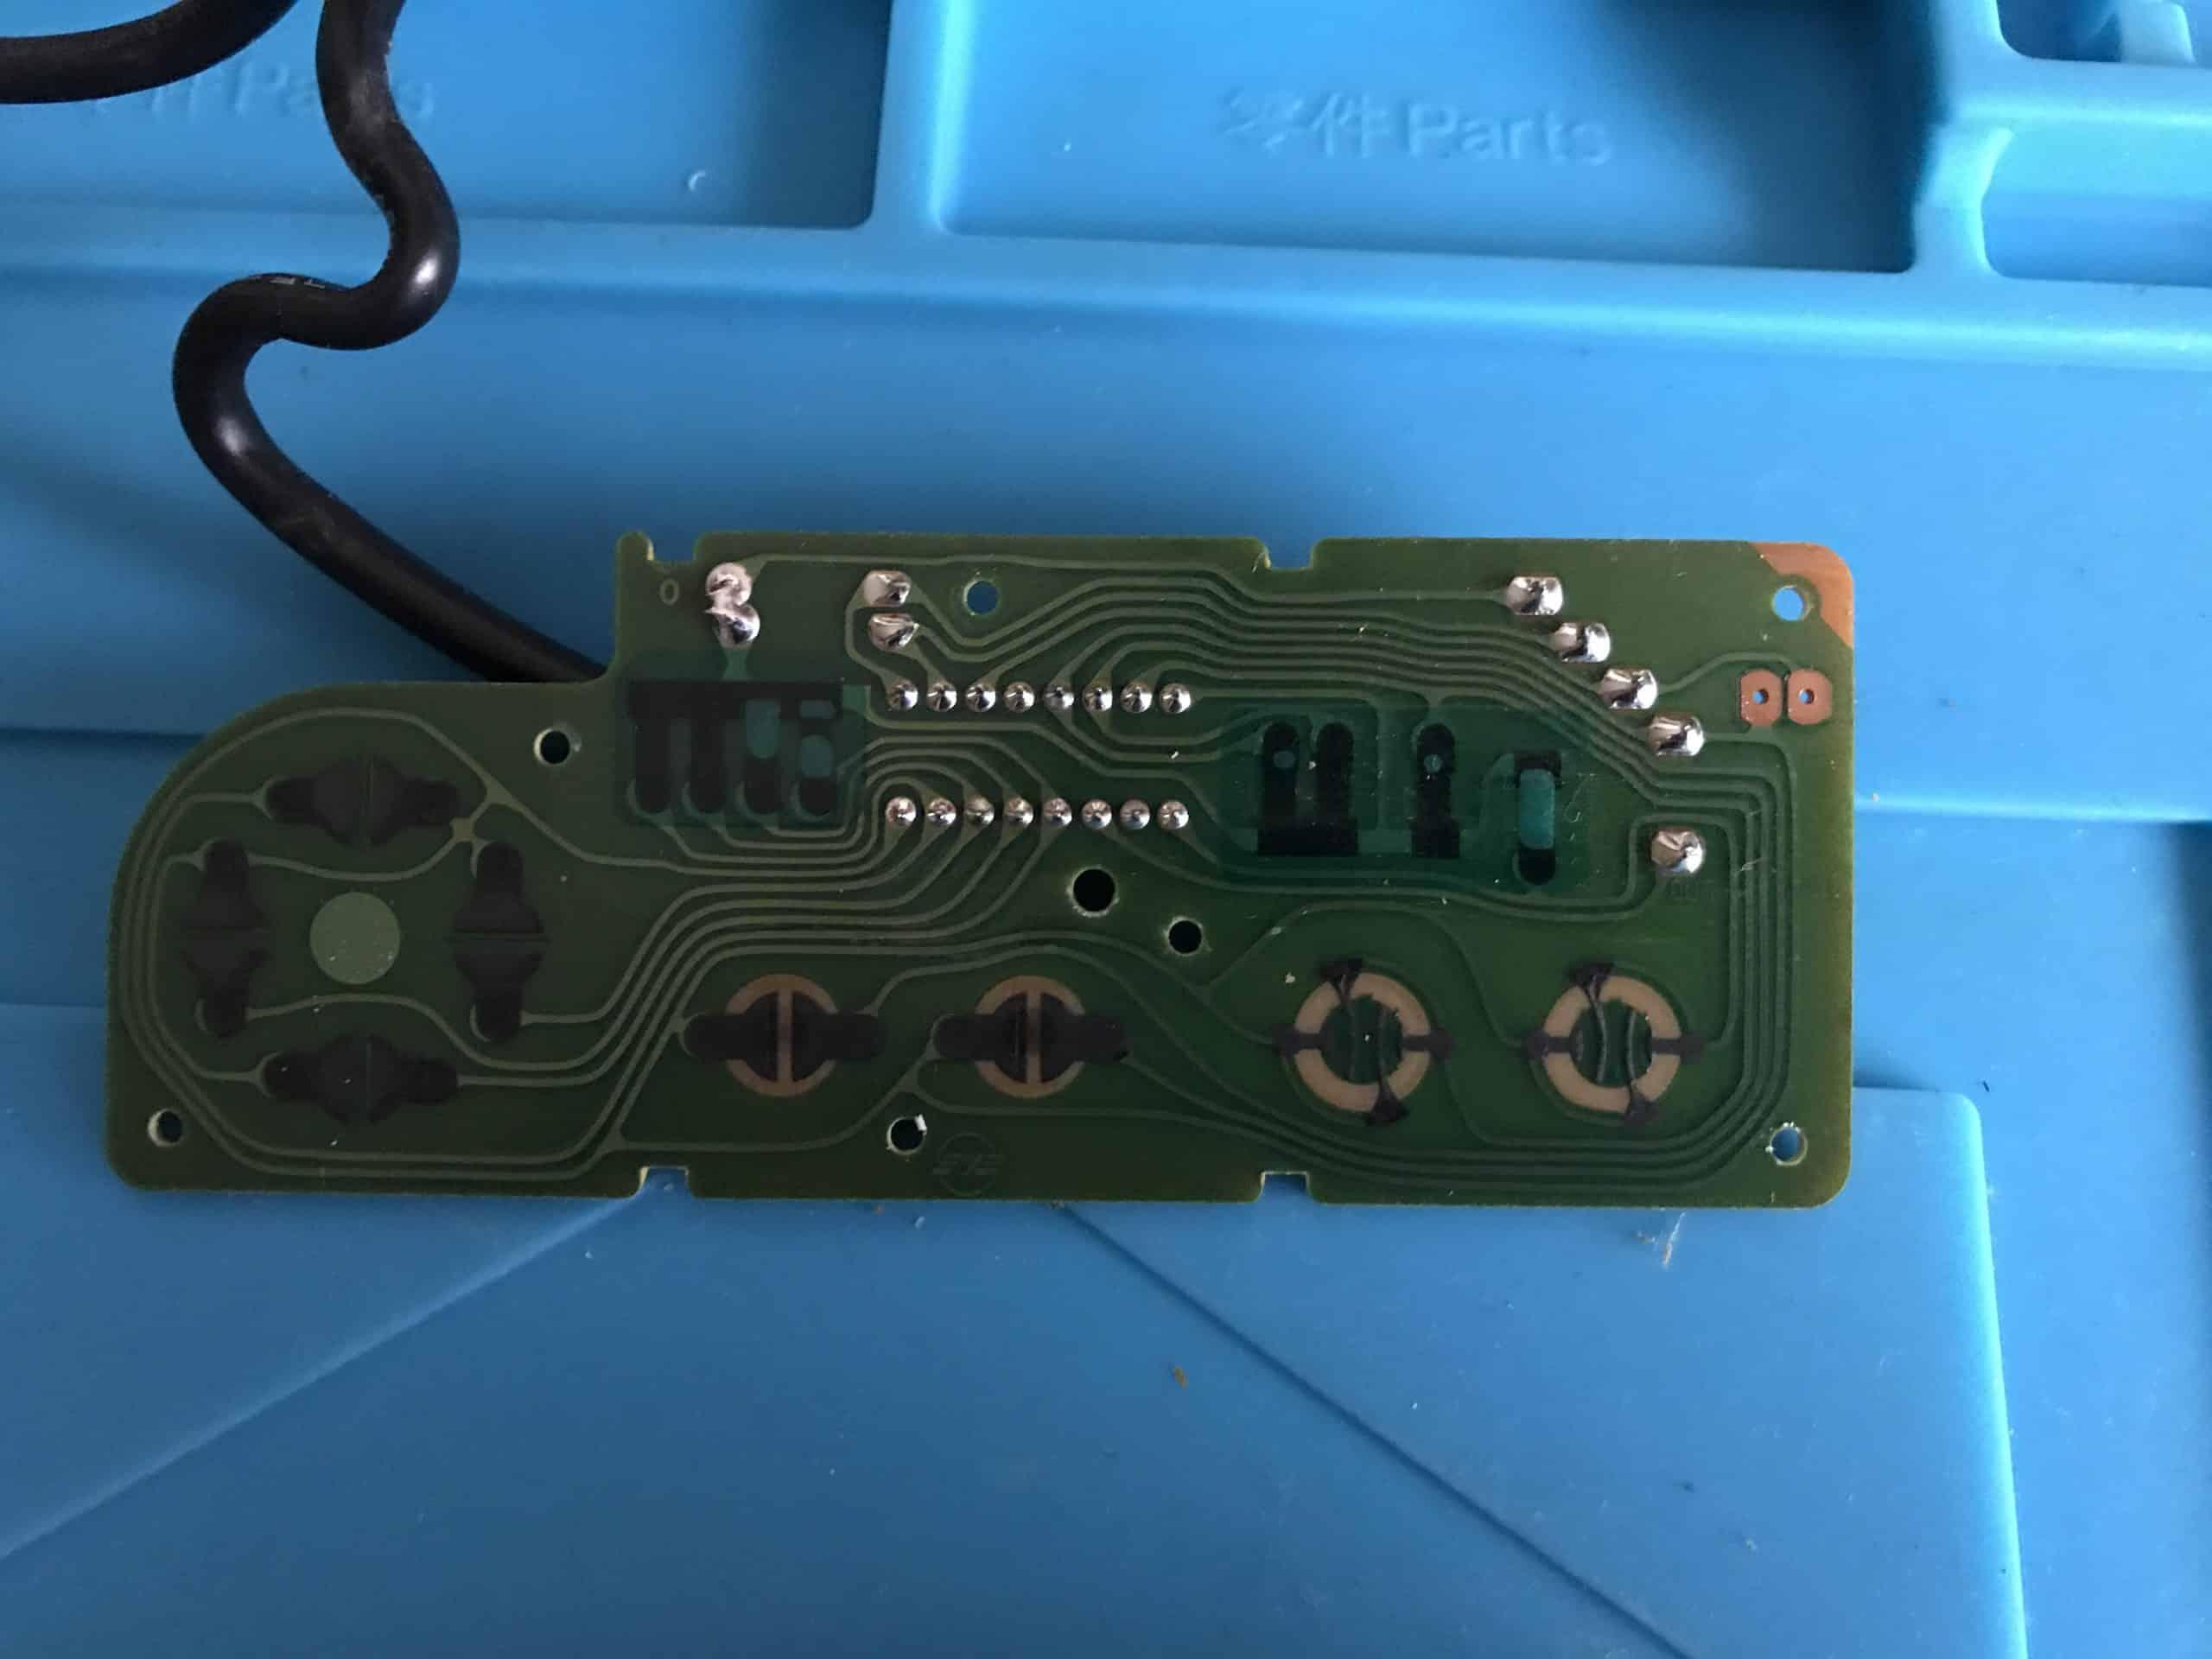 NES controller board